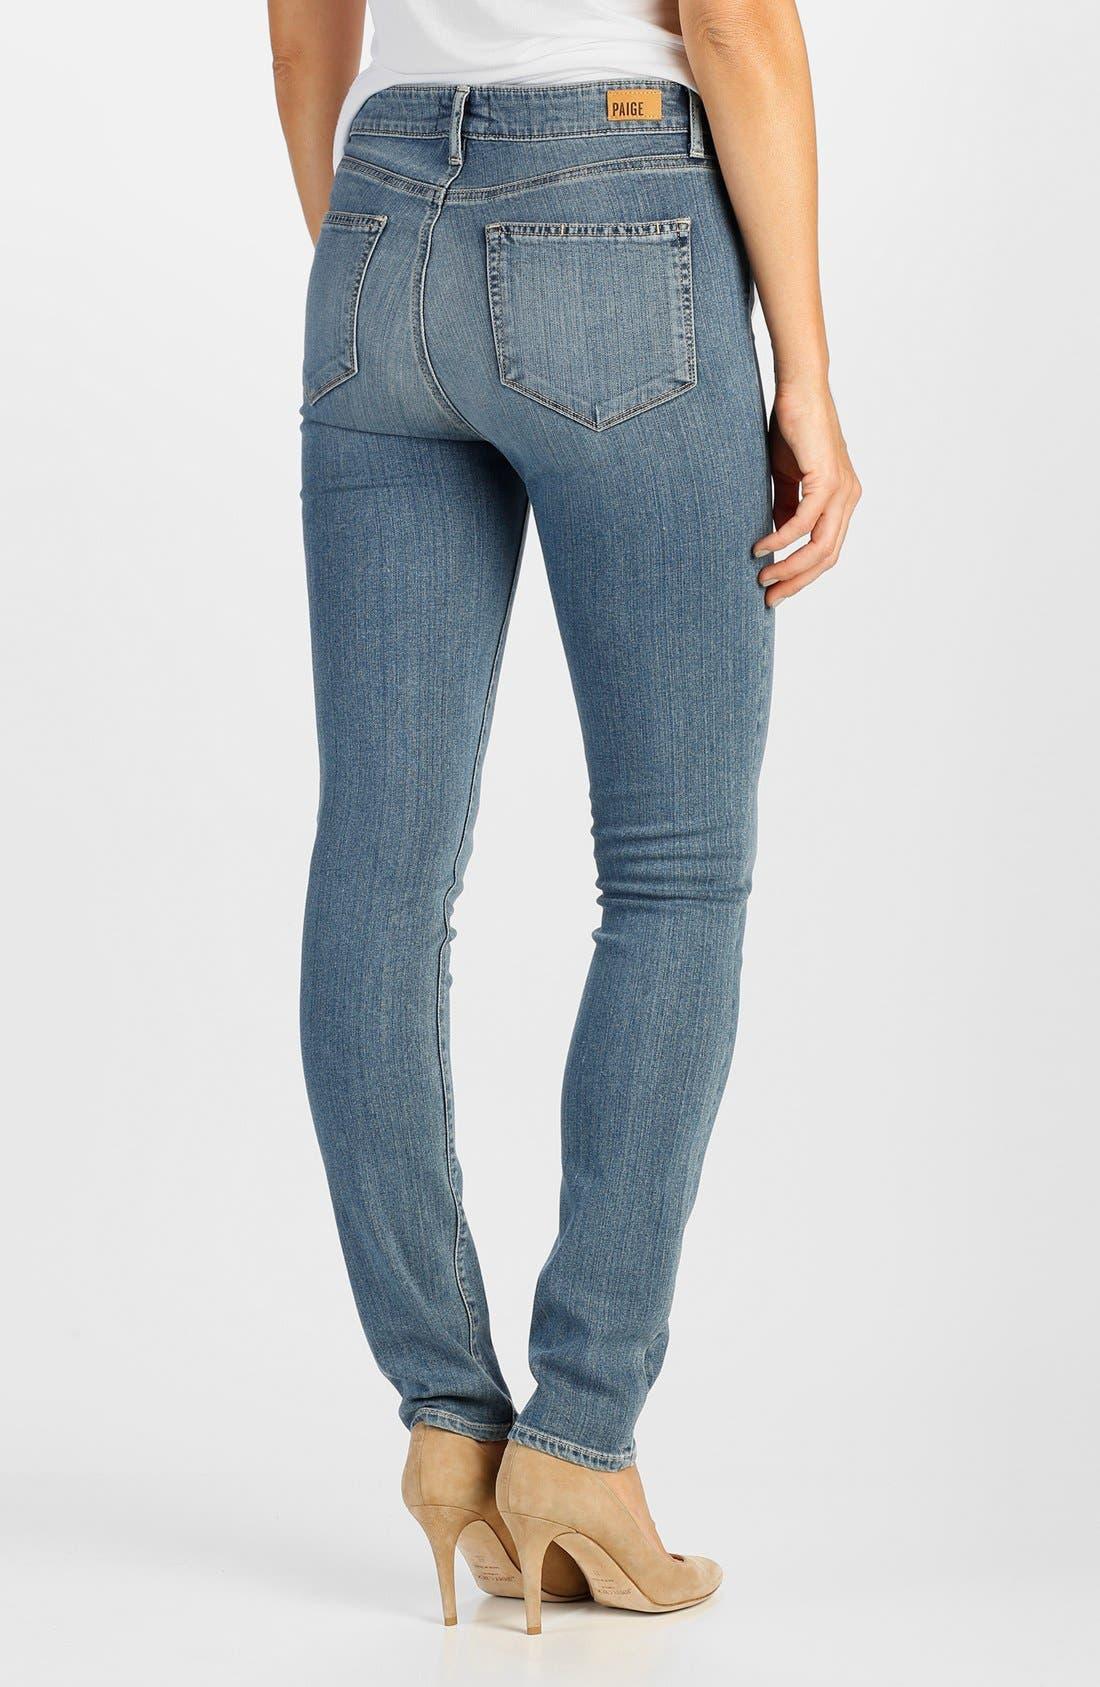 Alternate Image 2  - Paige Denim 'Transcend - Hoxton' High Rise Ultra Skinny Jeans (Teagan)